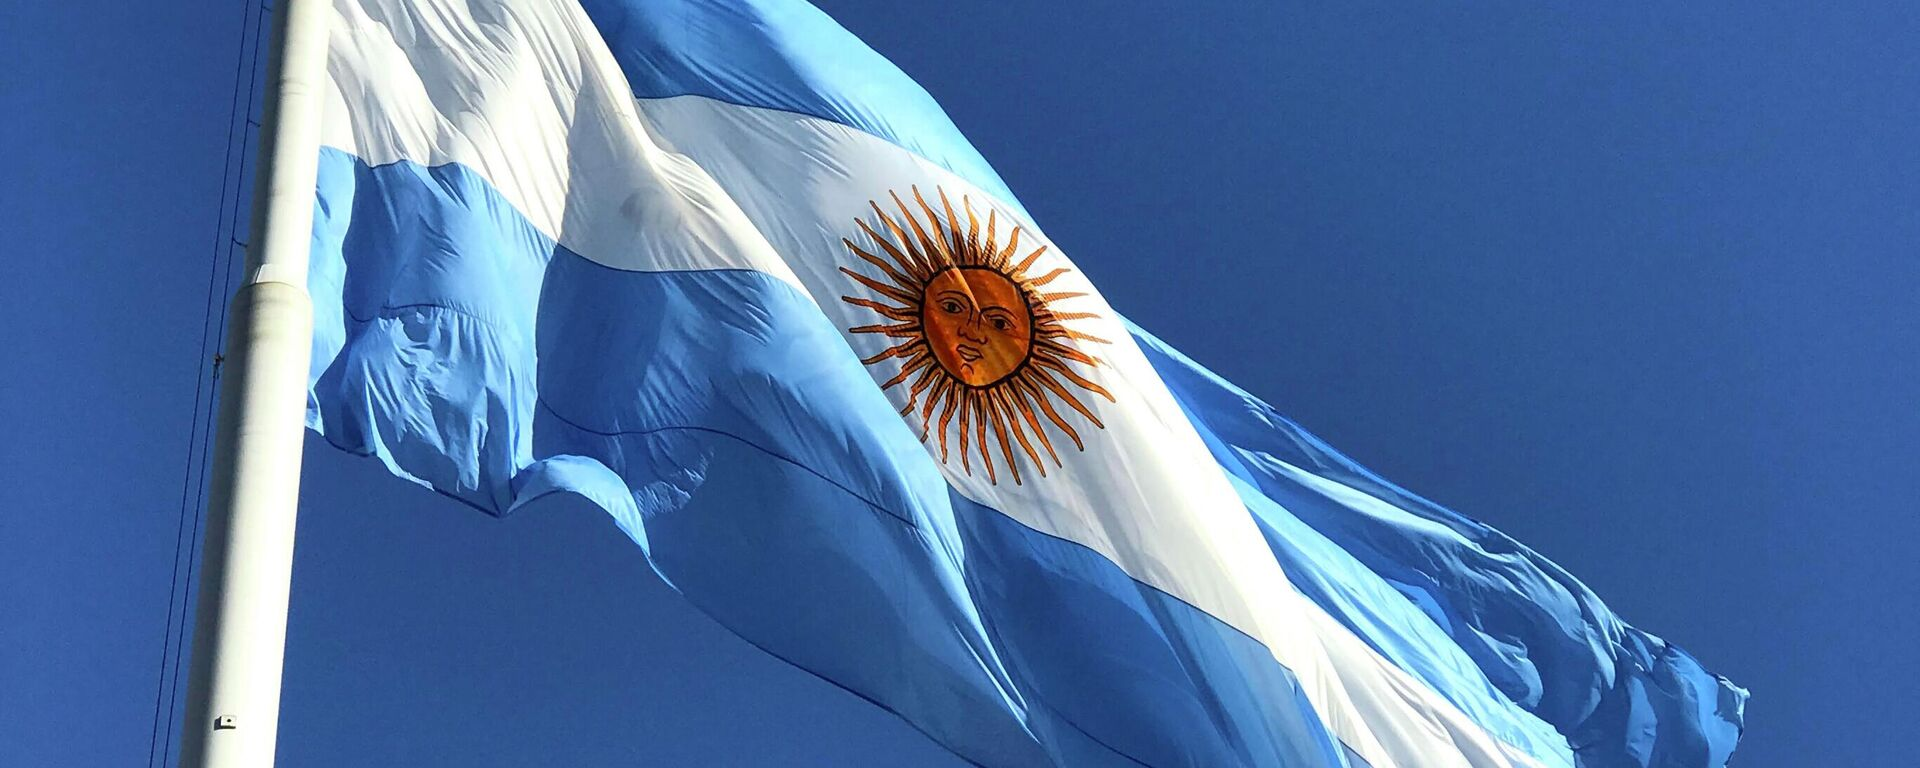 Bandera de Argentina - Sputnik Mundo, 1920, 11.09.2021